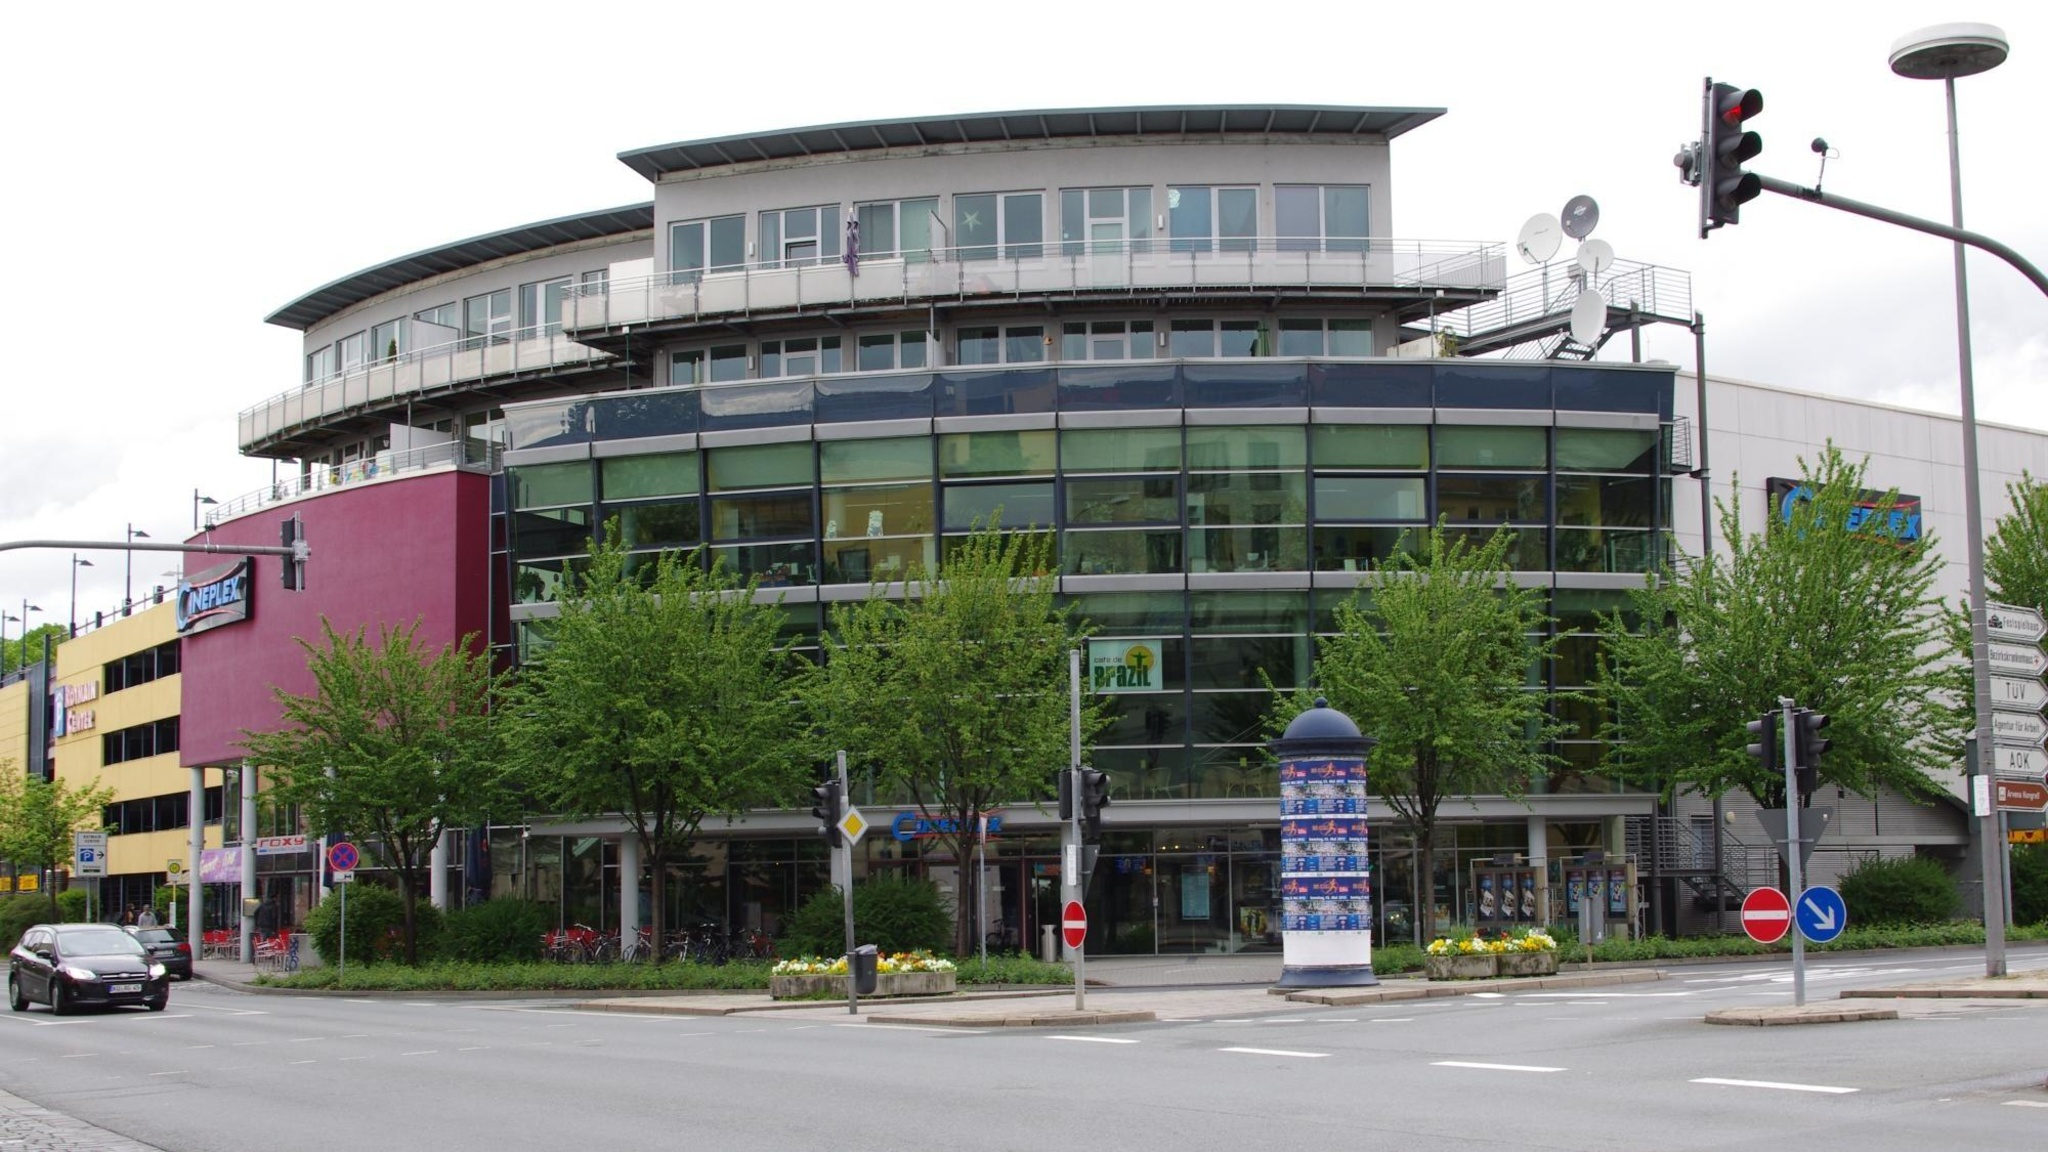 Kino Bayreuth